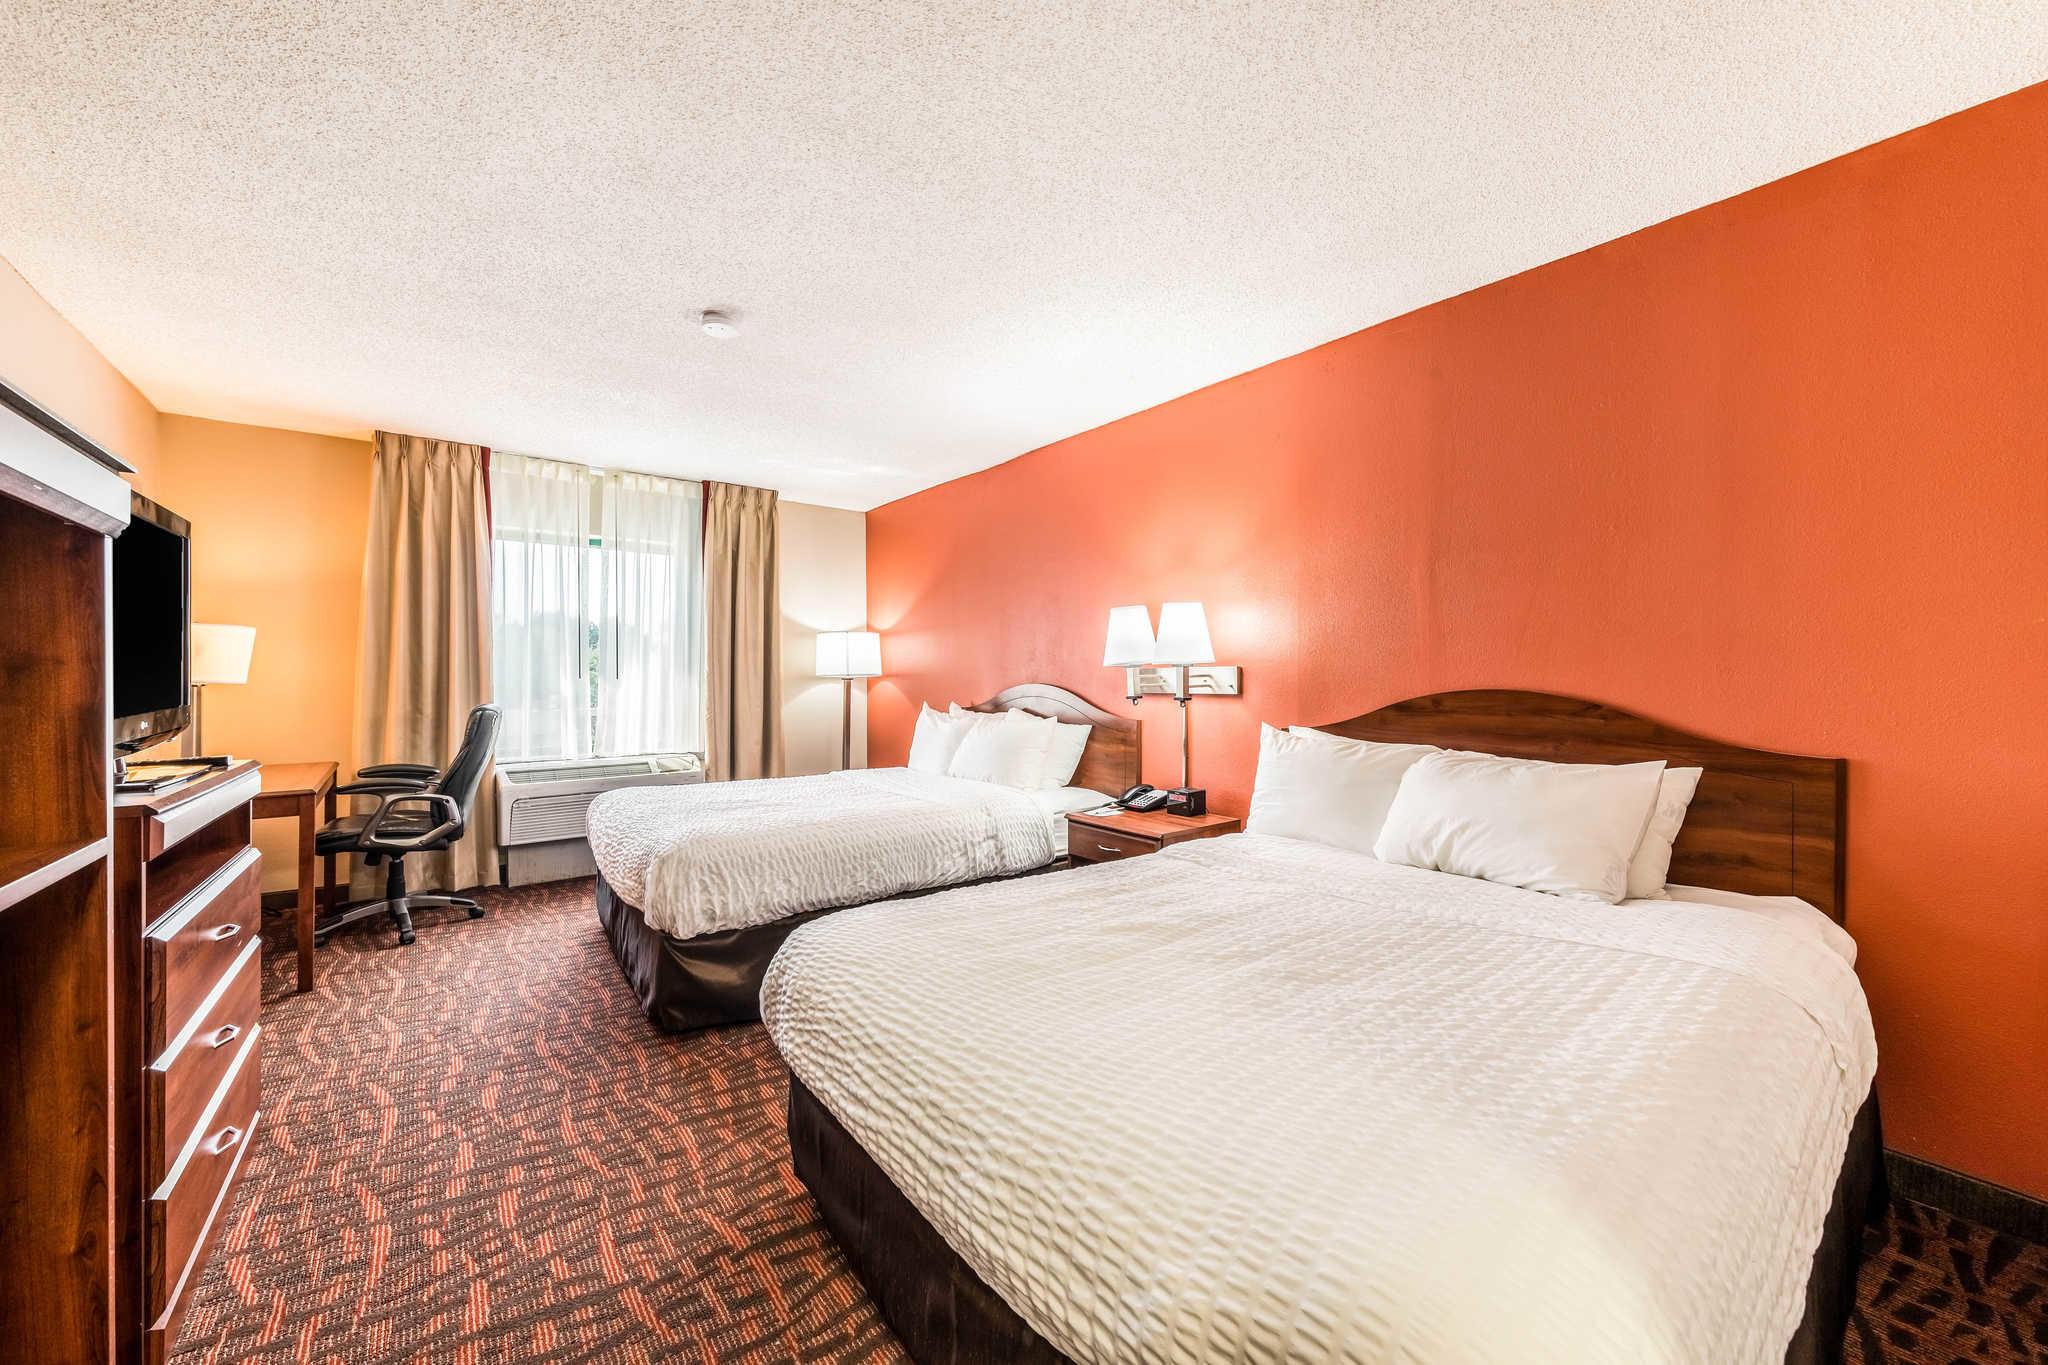 Clarion Inn & Suites image 12